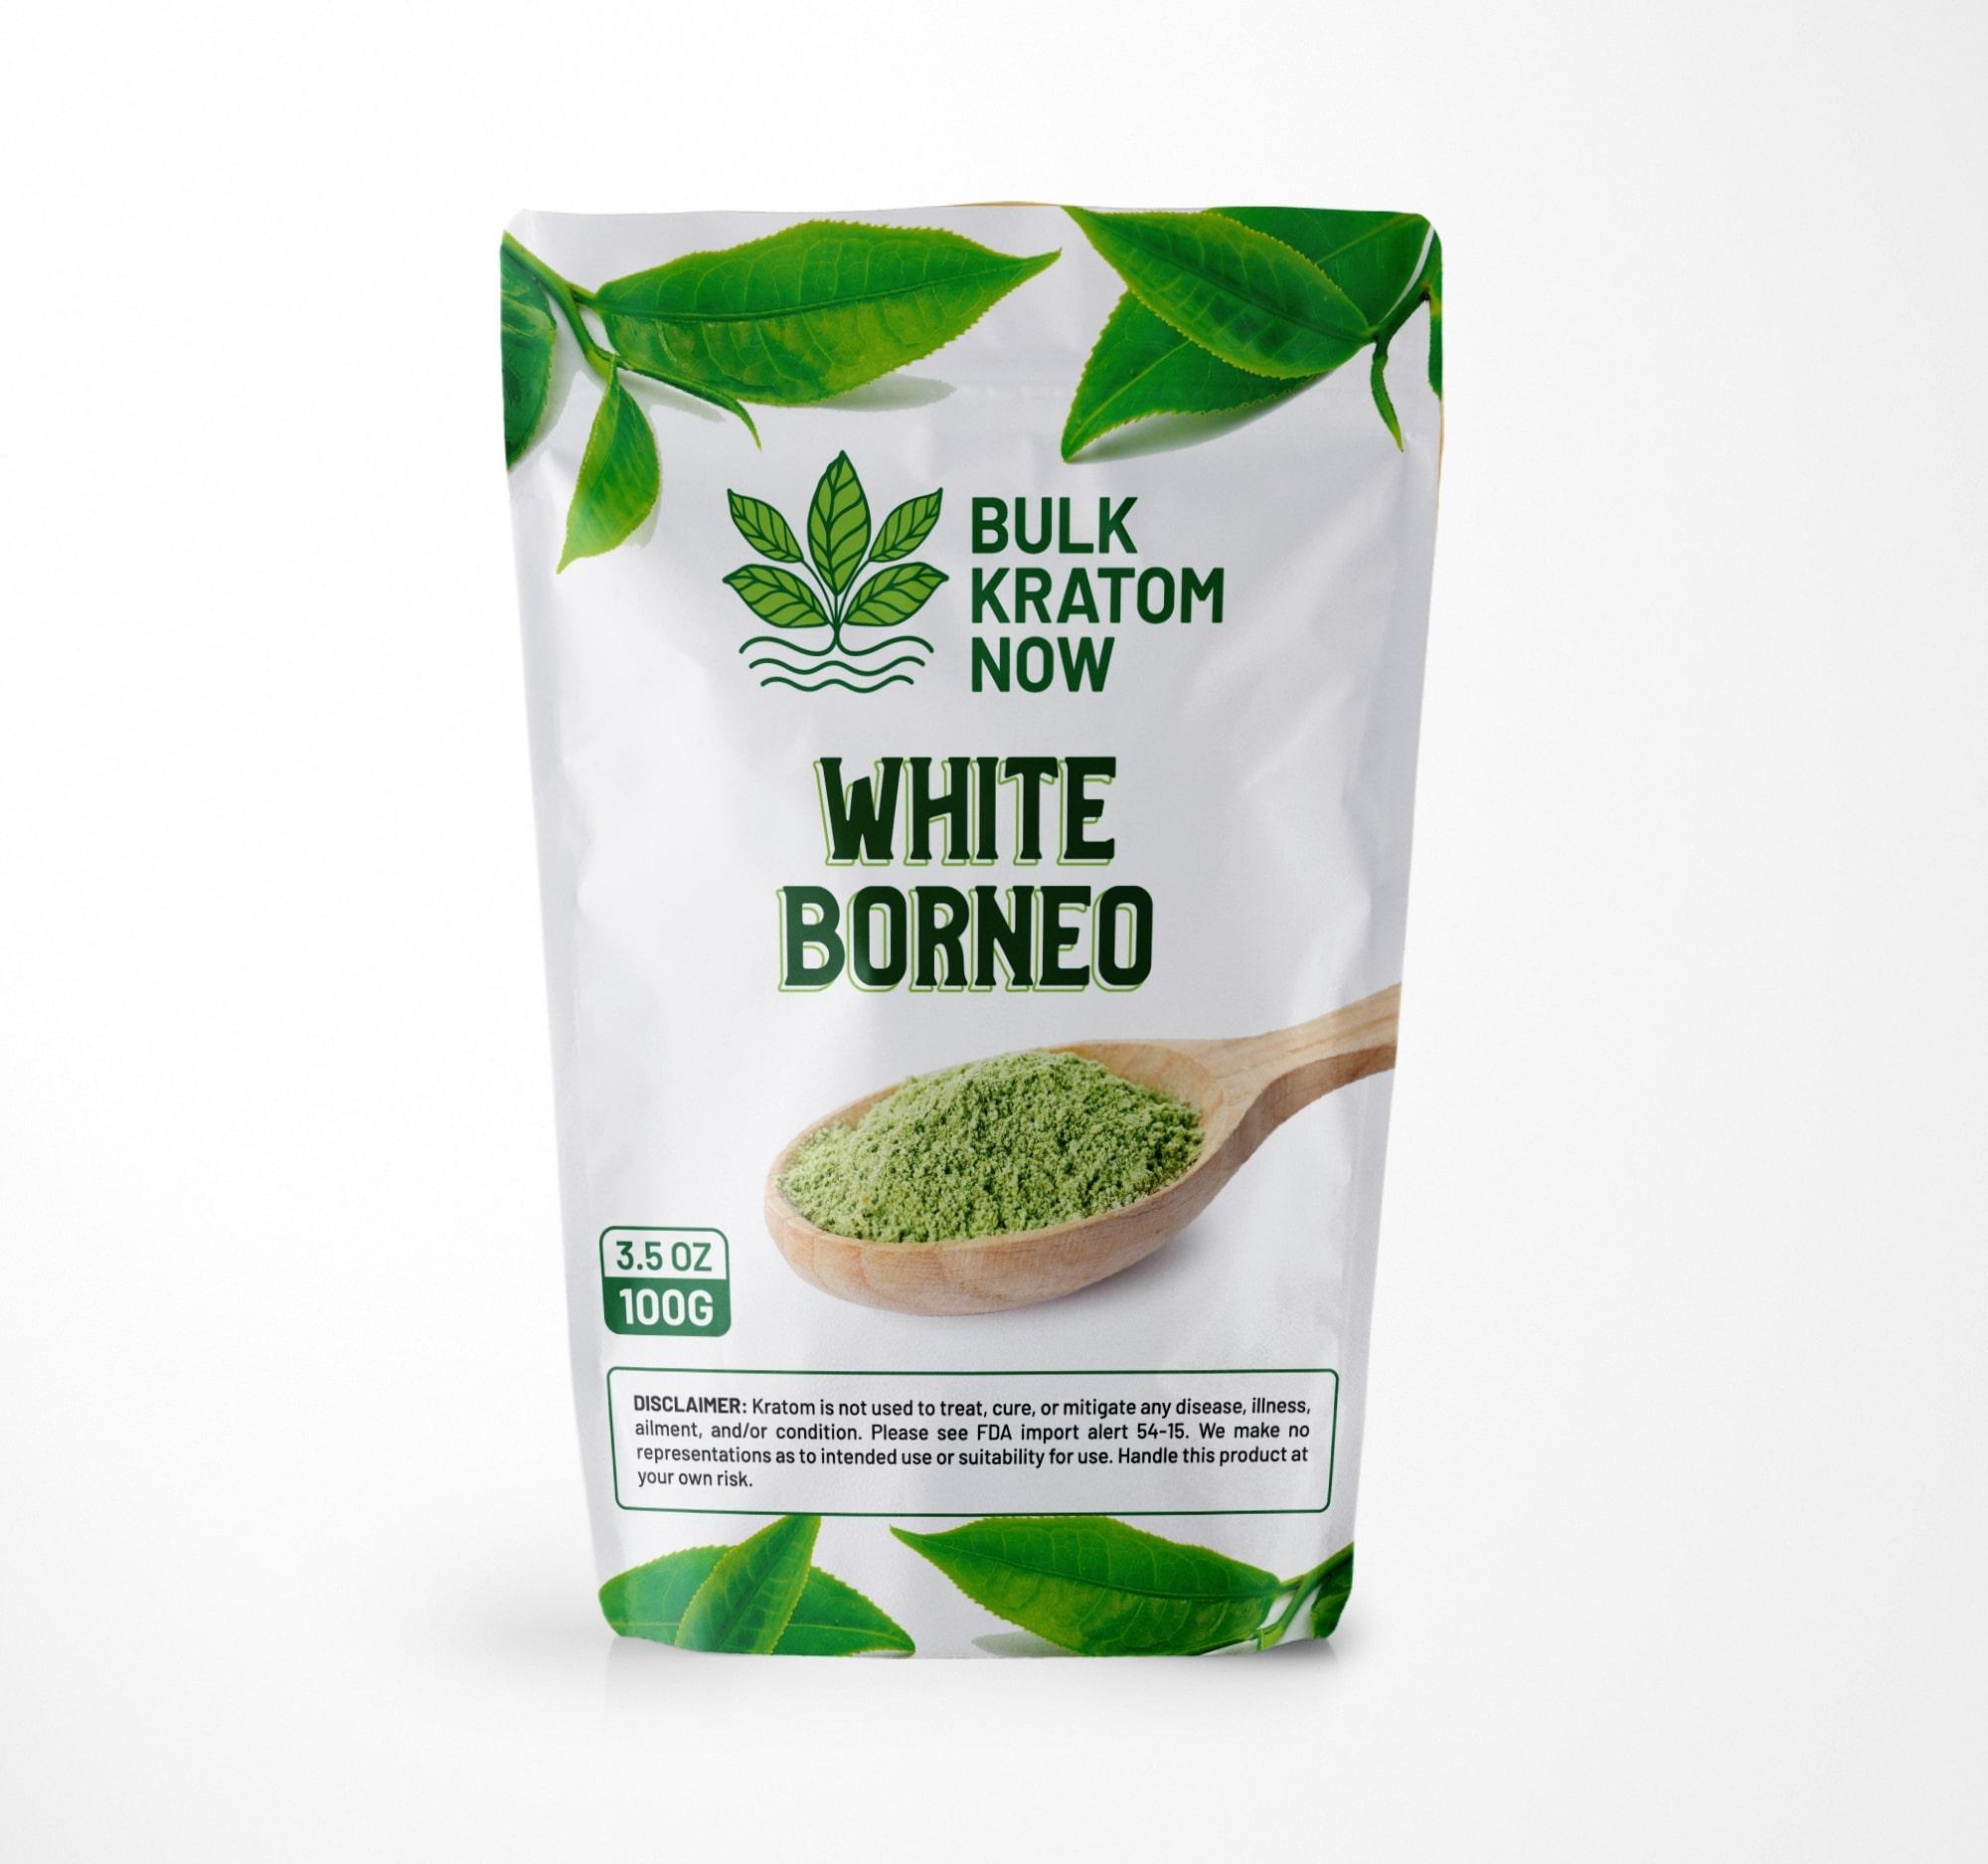 White Borneo Bulk Kratom